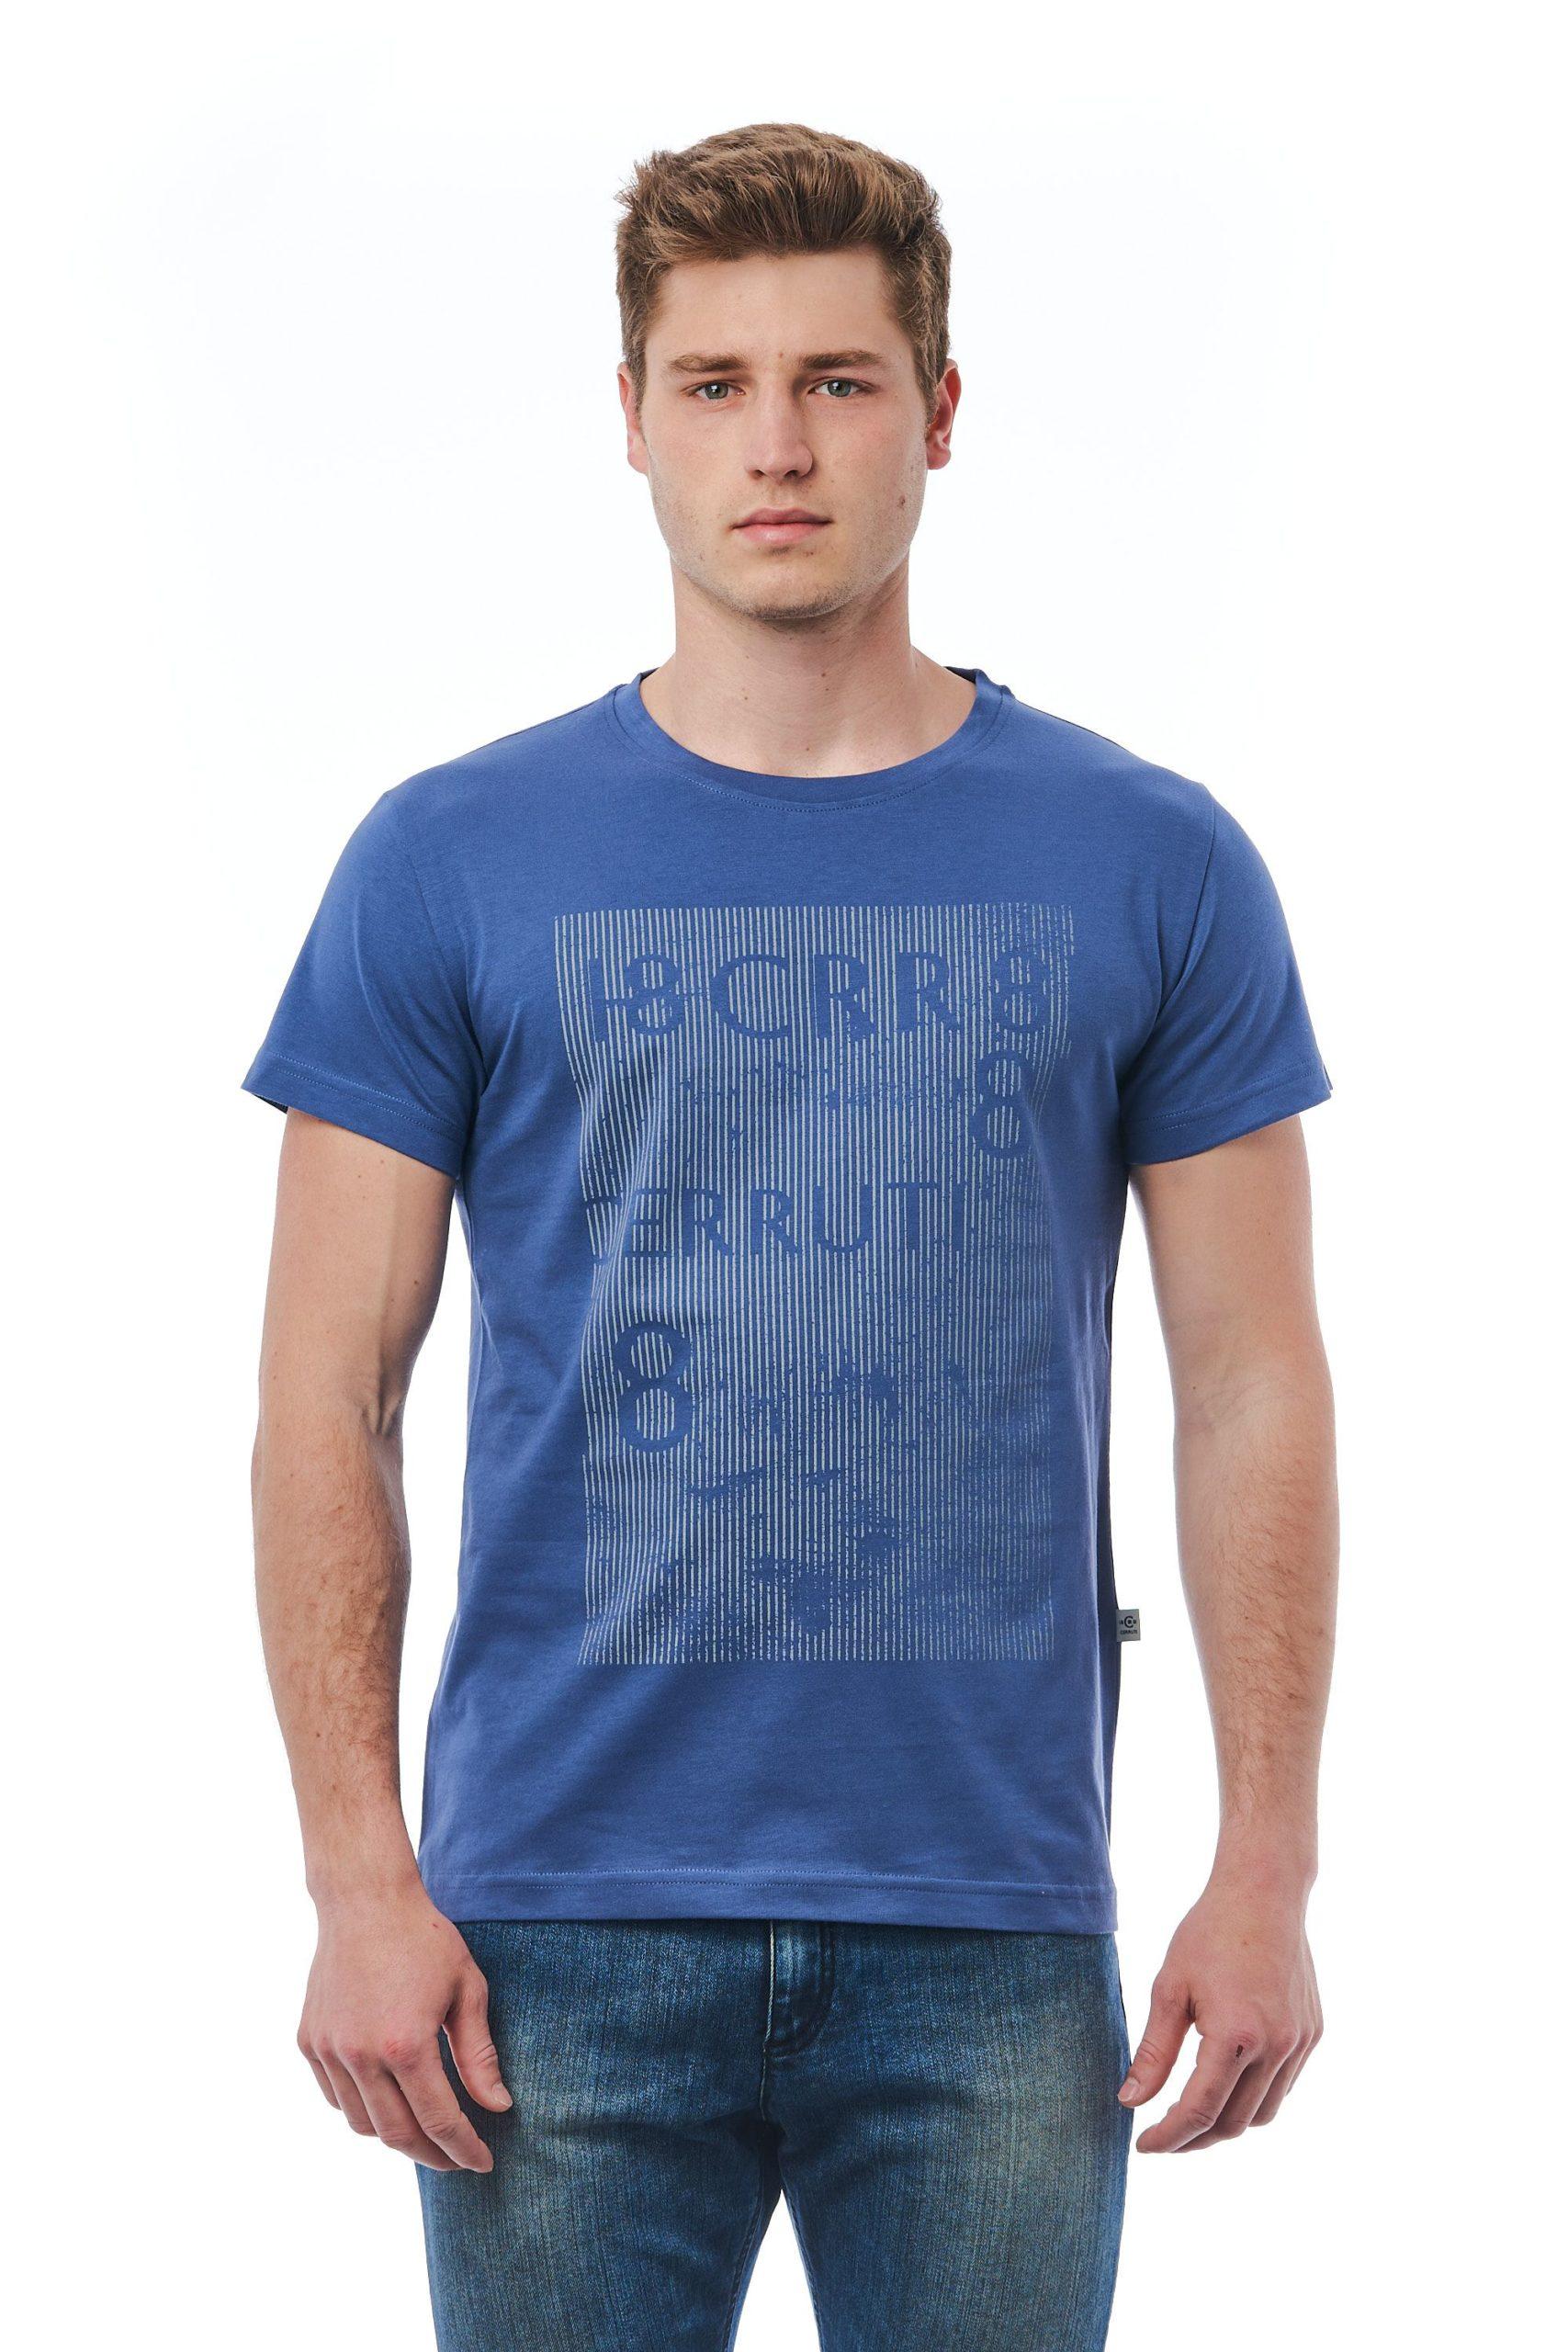 Cerruti 1881 Men's Avio T-Shirt Blue CE1409784 - L